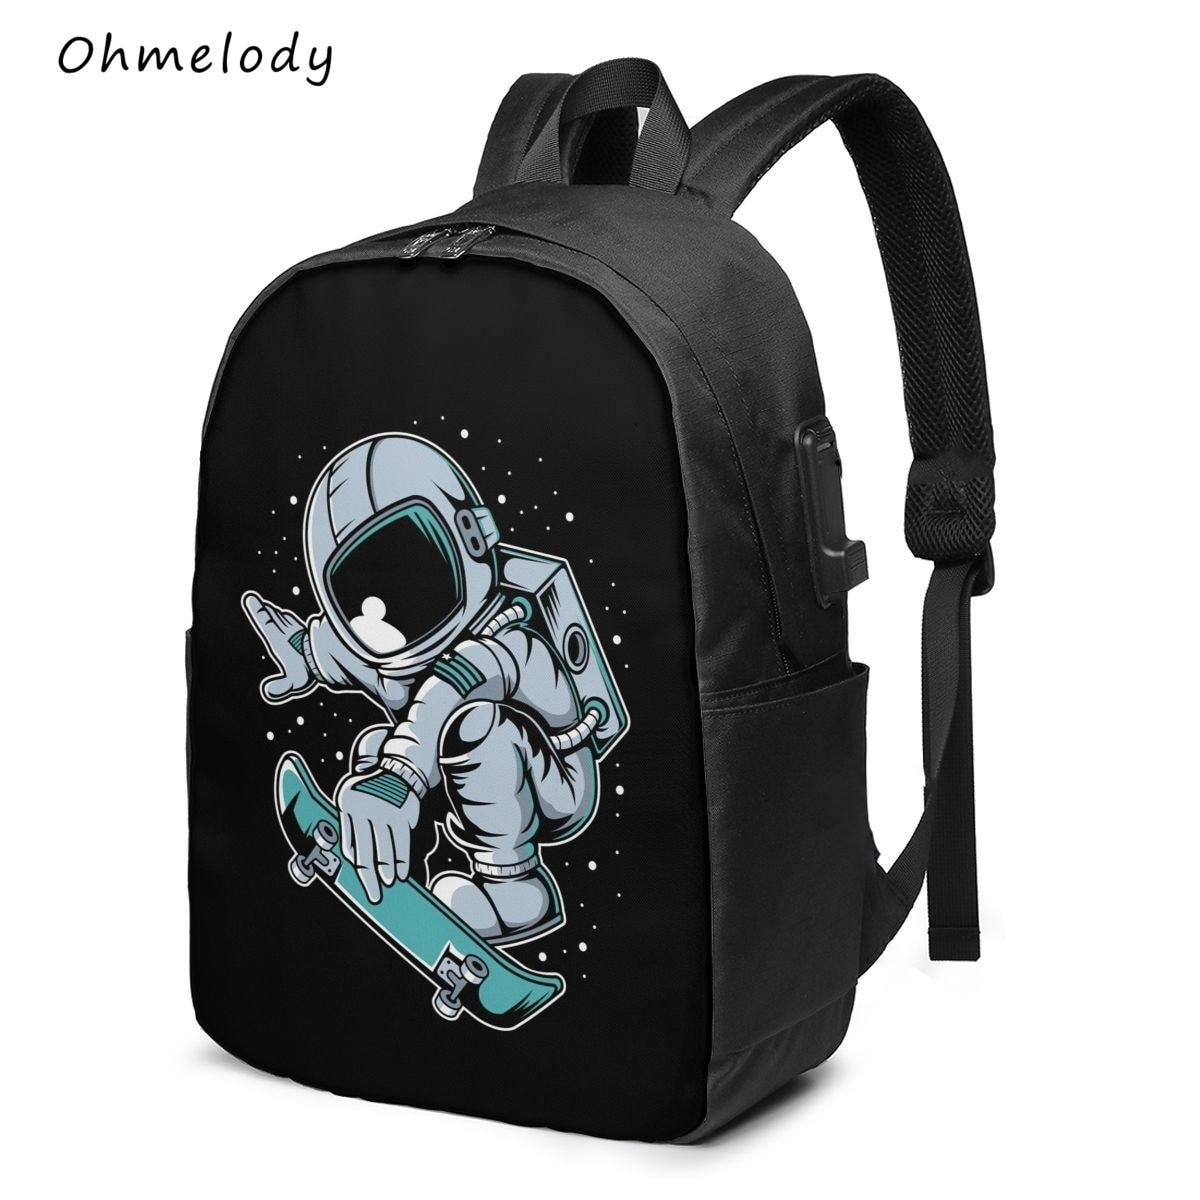 Teenage Boys 17in Laptop Backpack Water Resistant Durable Cartoon Astronaut School Bag College Backp